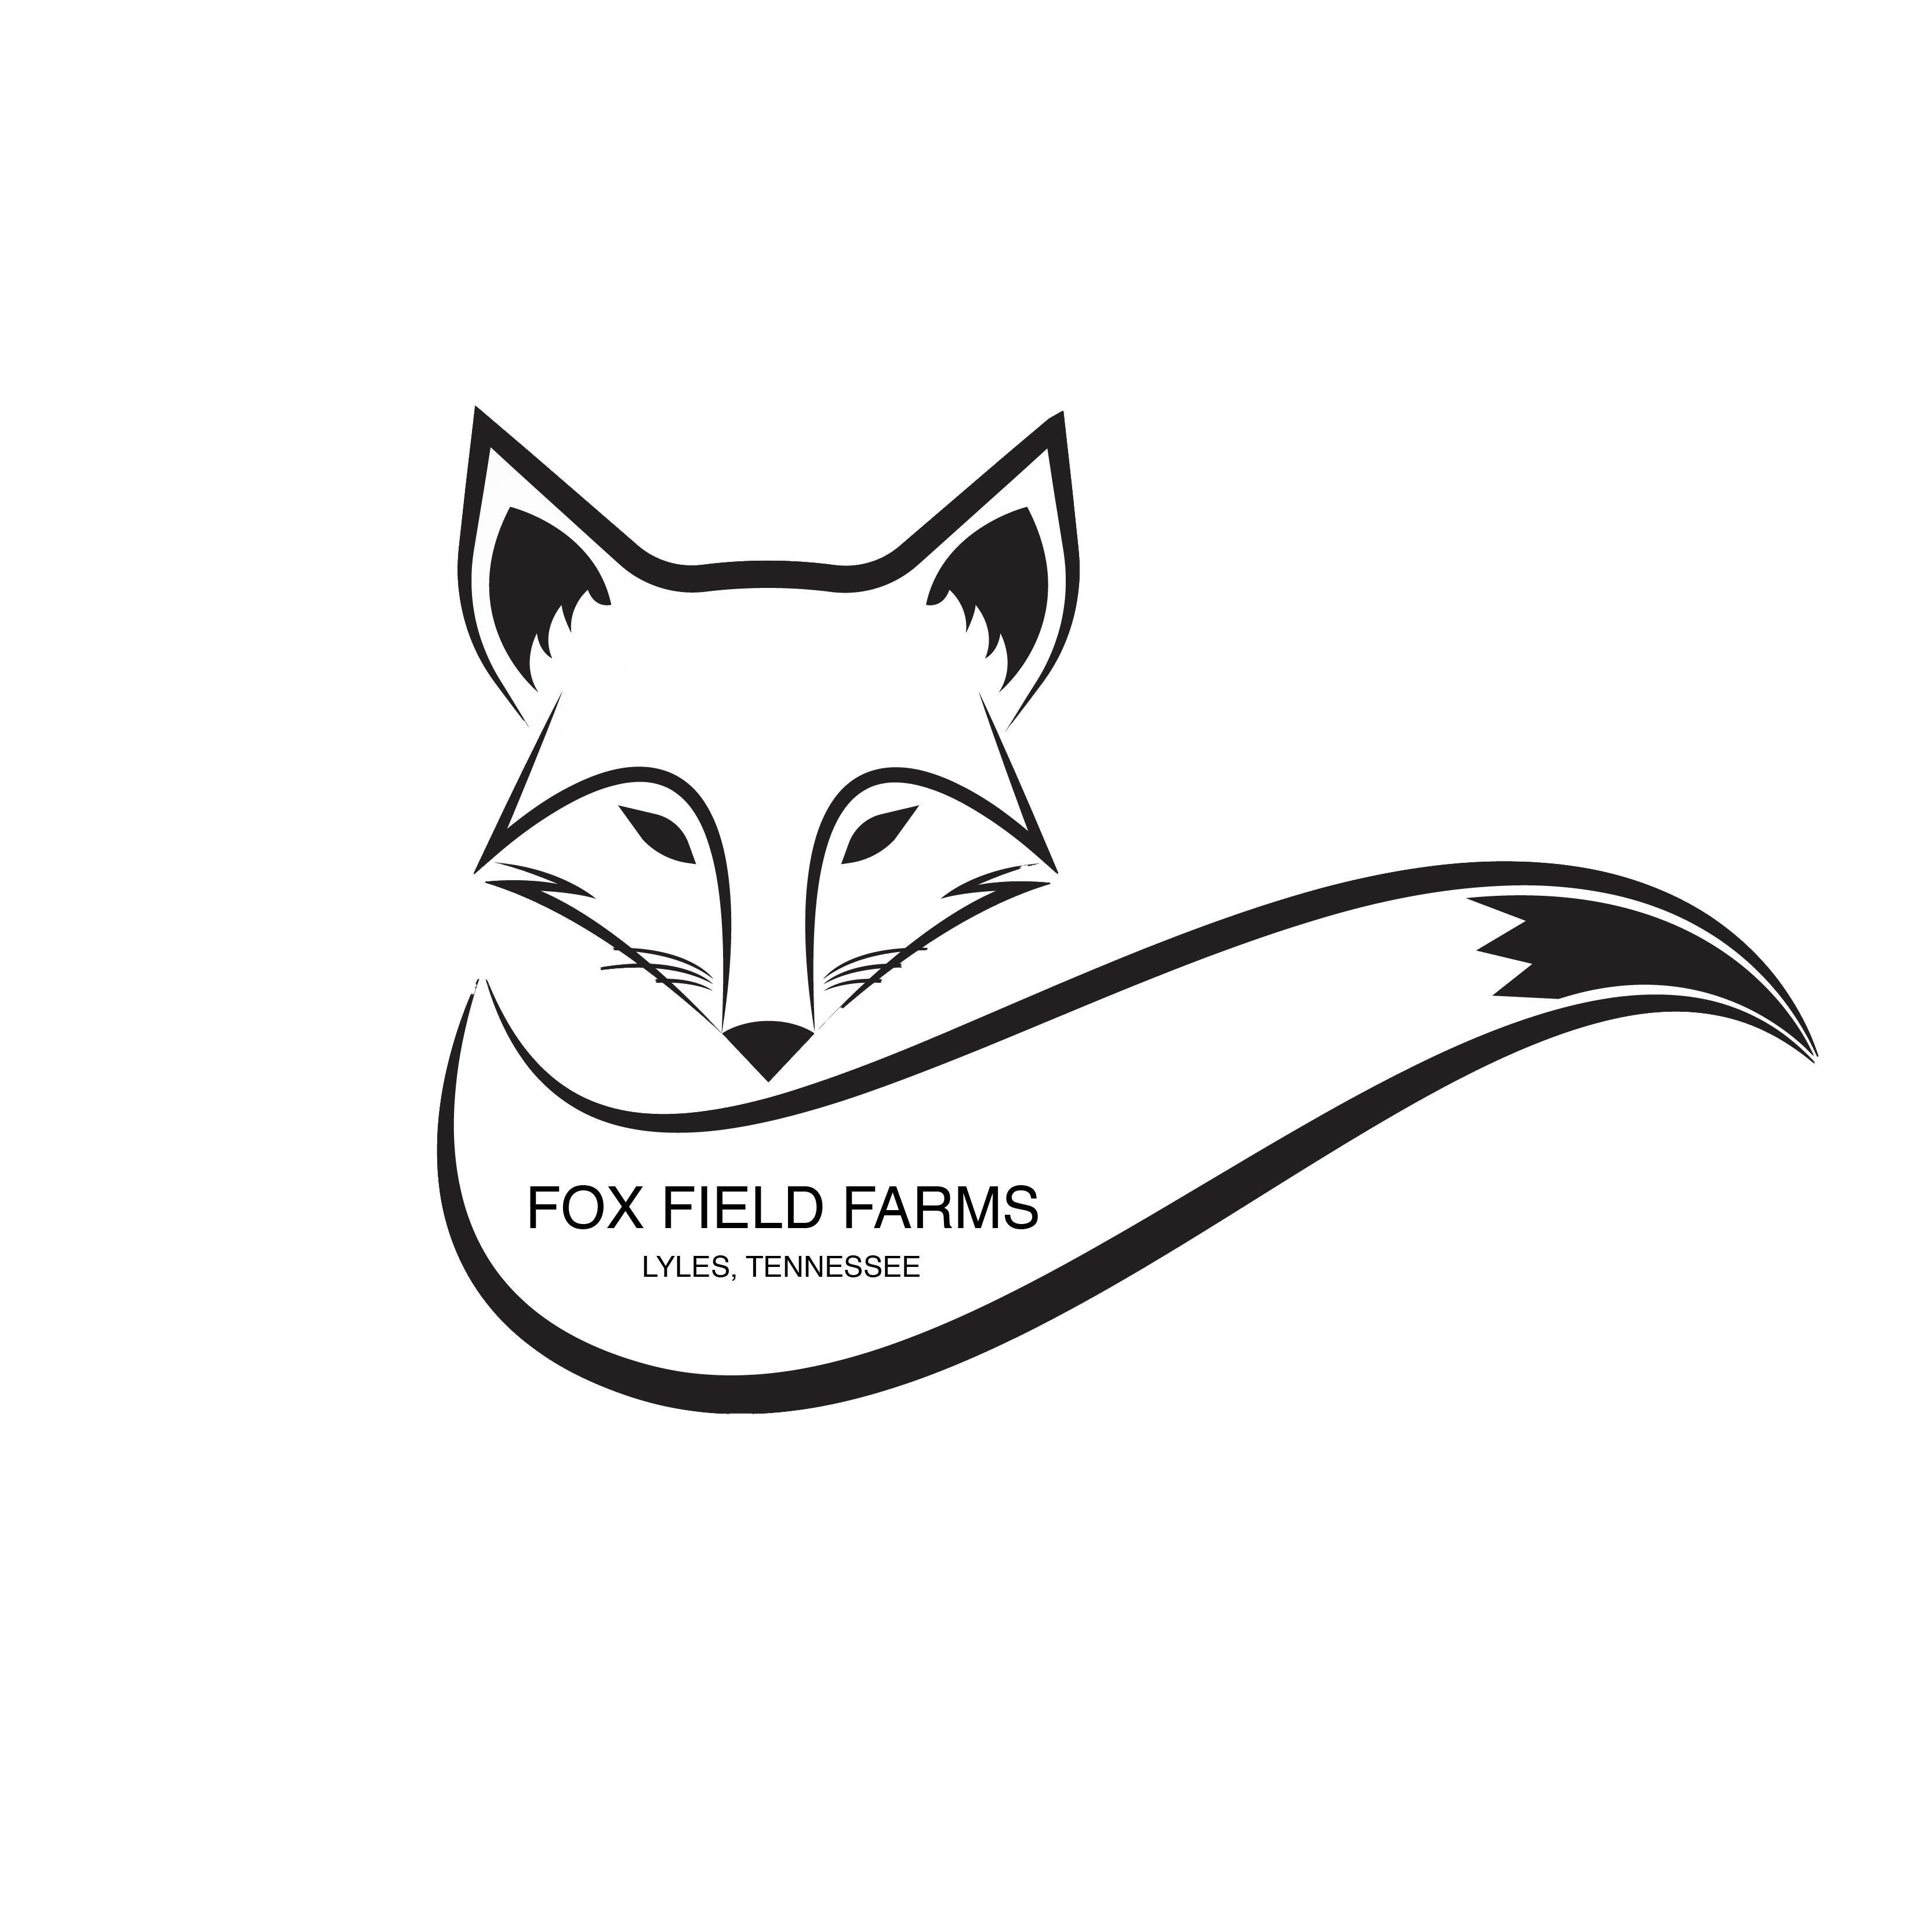 Fox Field Farms